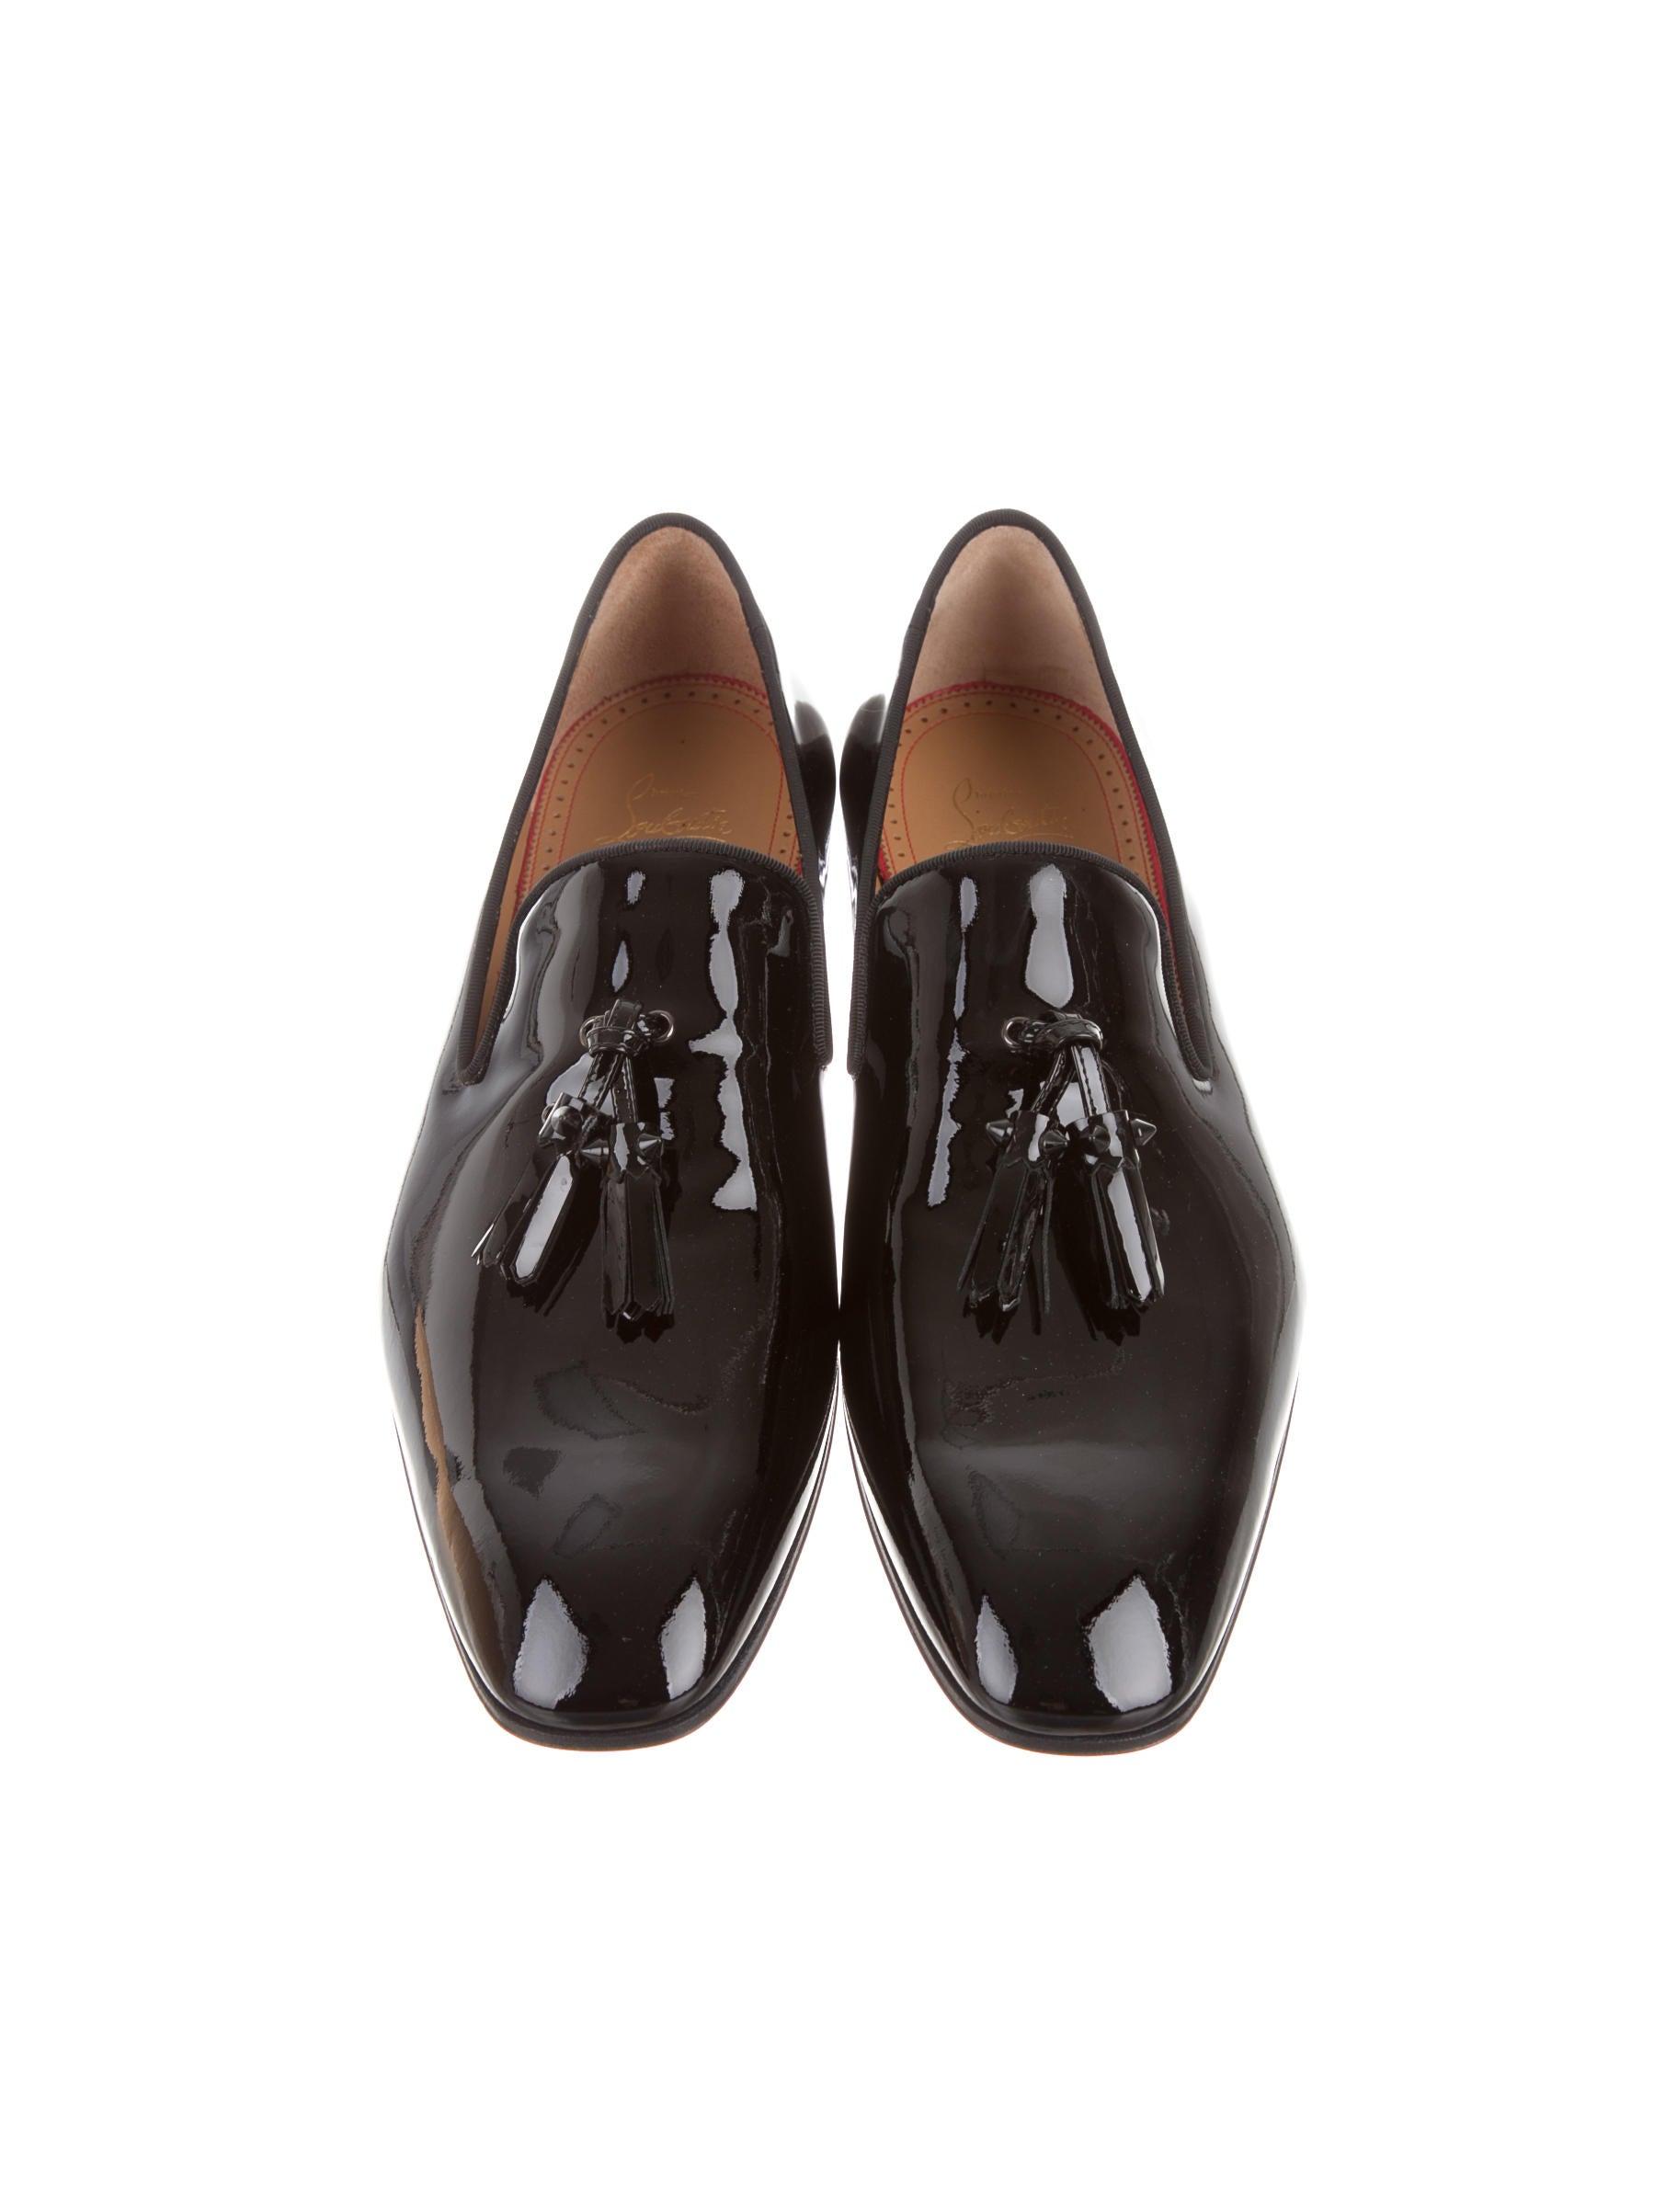 278bb67cabe ... replica mens louboutin - Christian Louboutin Dandelion Tassel Flat  Loafers - Mens Shoes ... christian louboutin leather ...